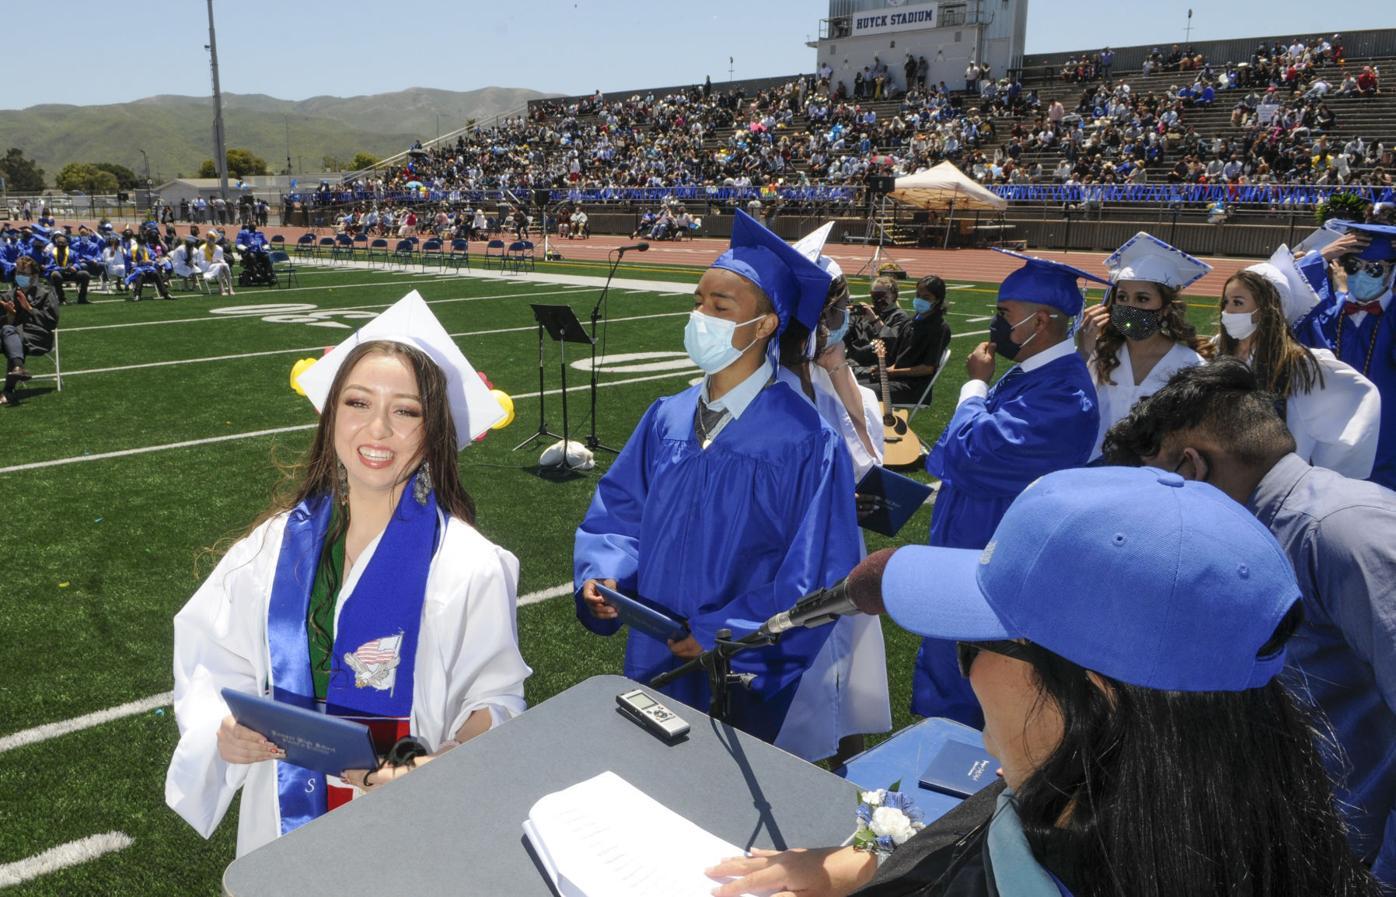 061021 Lompoc graduation 02.JPG